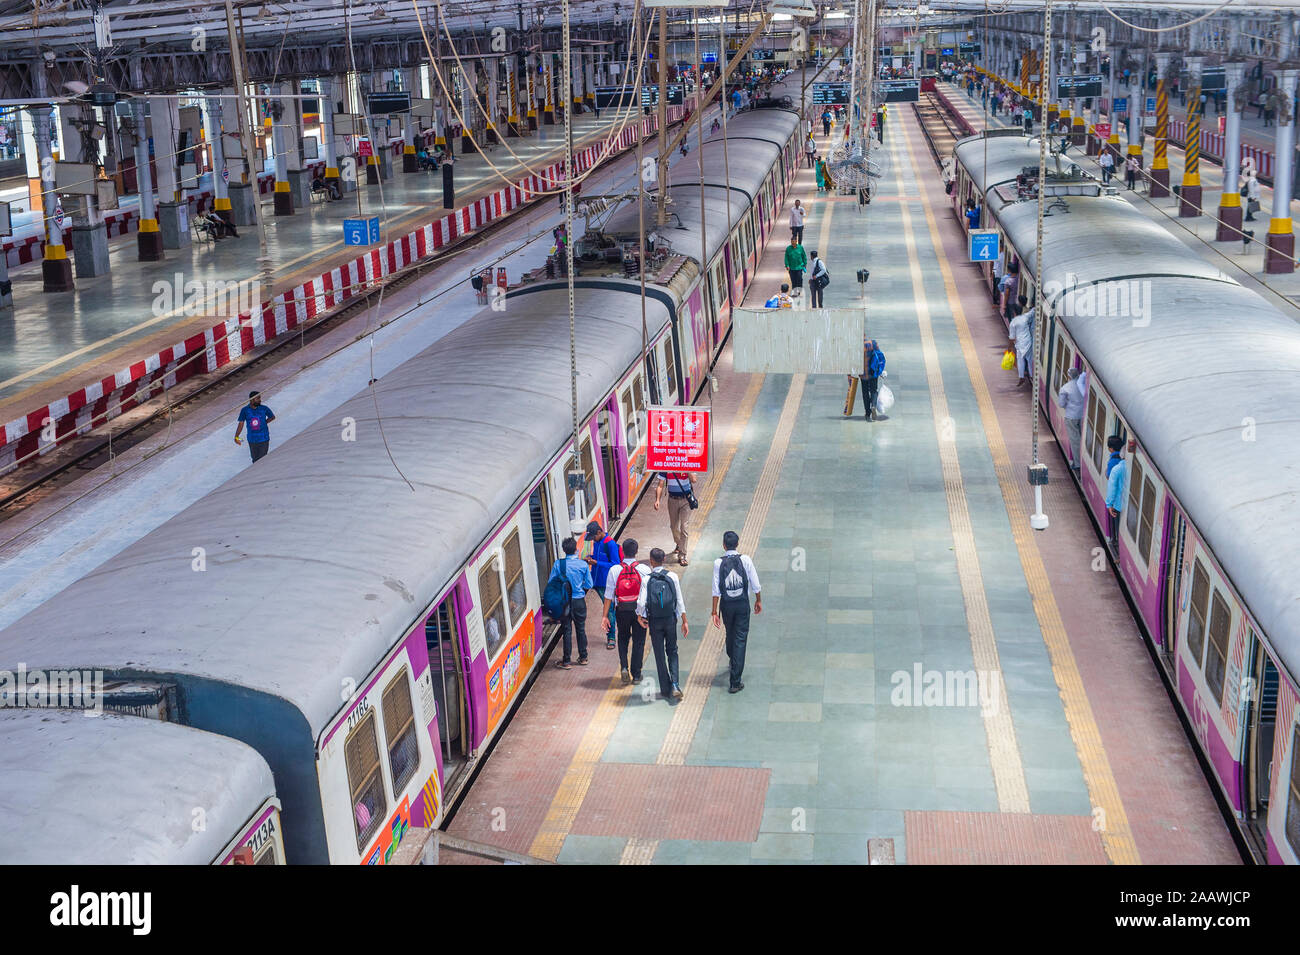 The suburban railway in Mumbai India Stock Photo